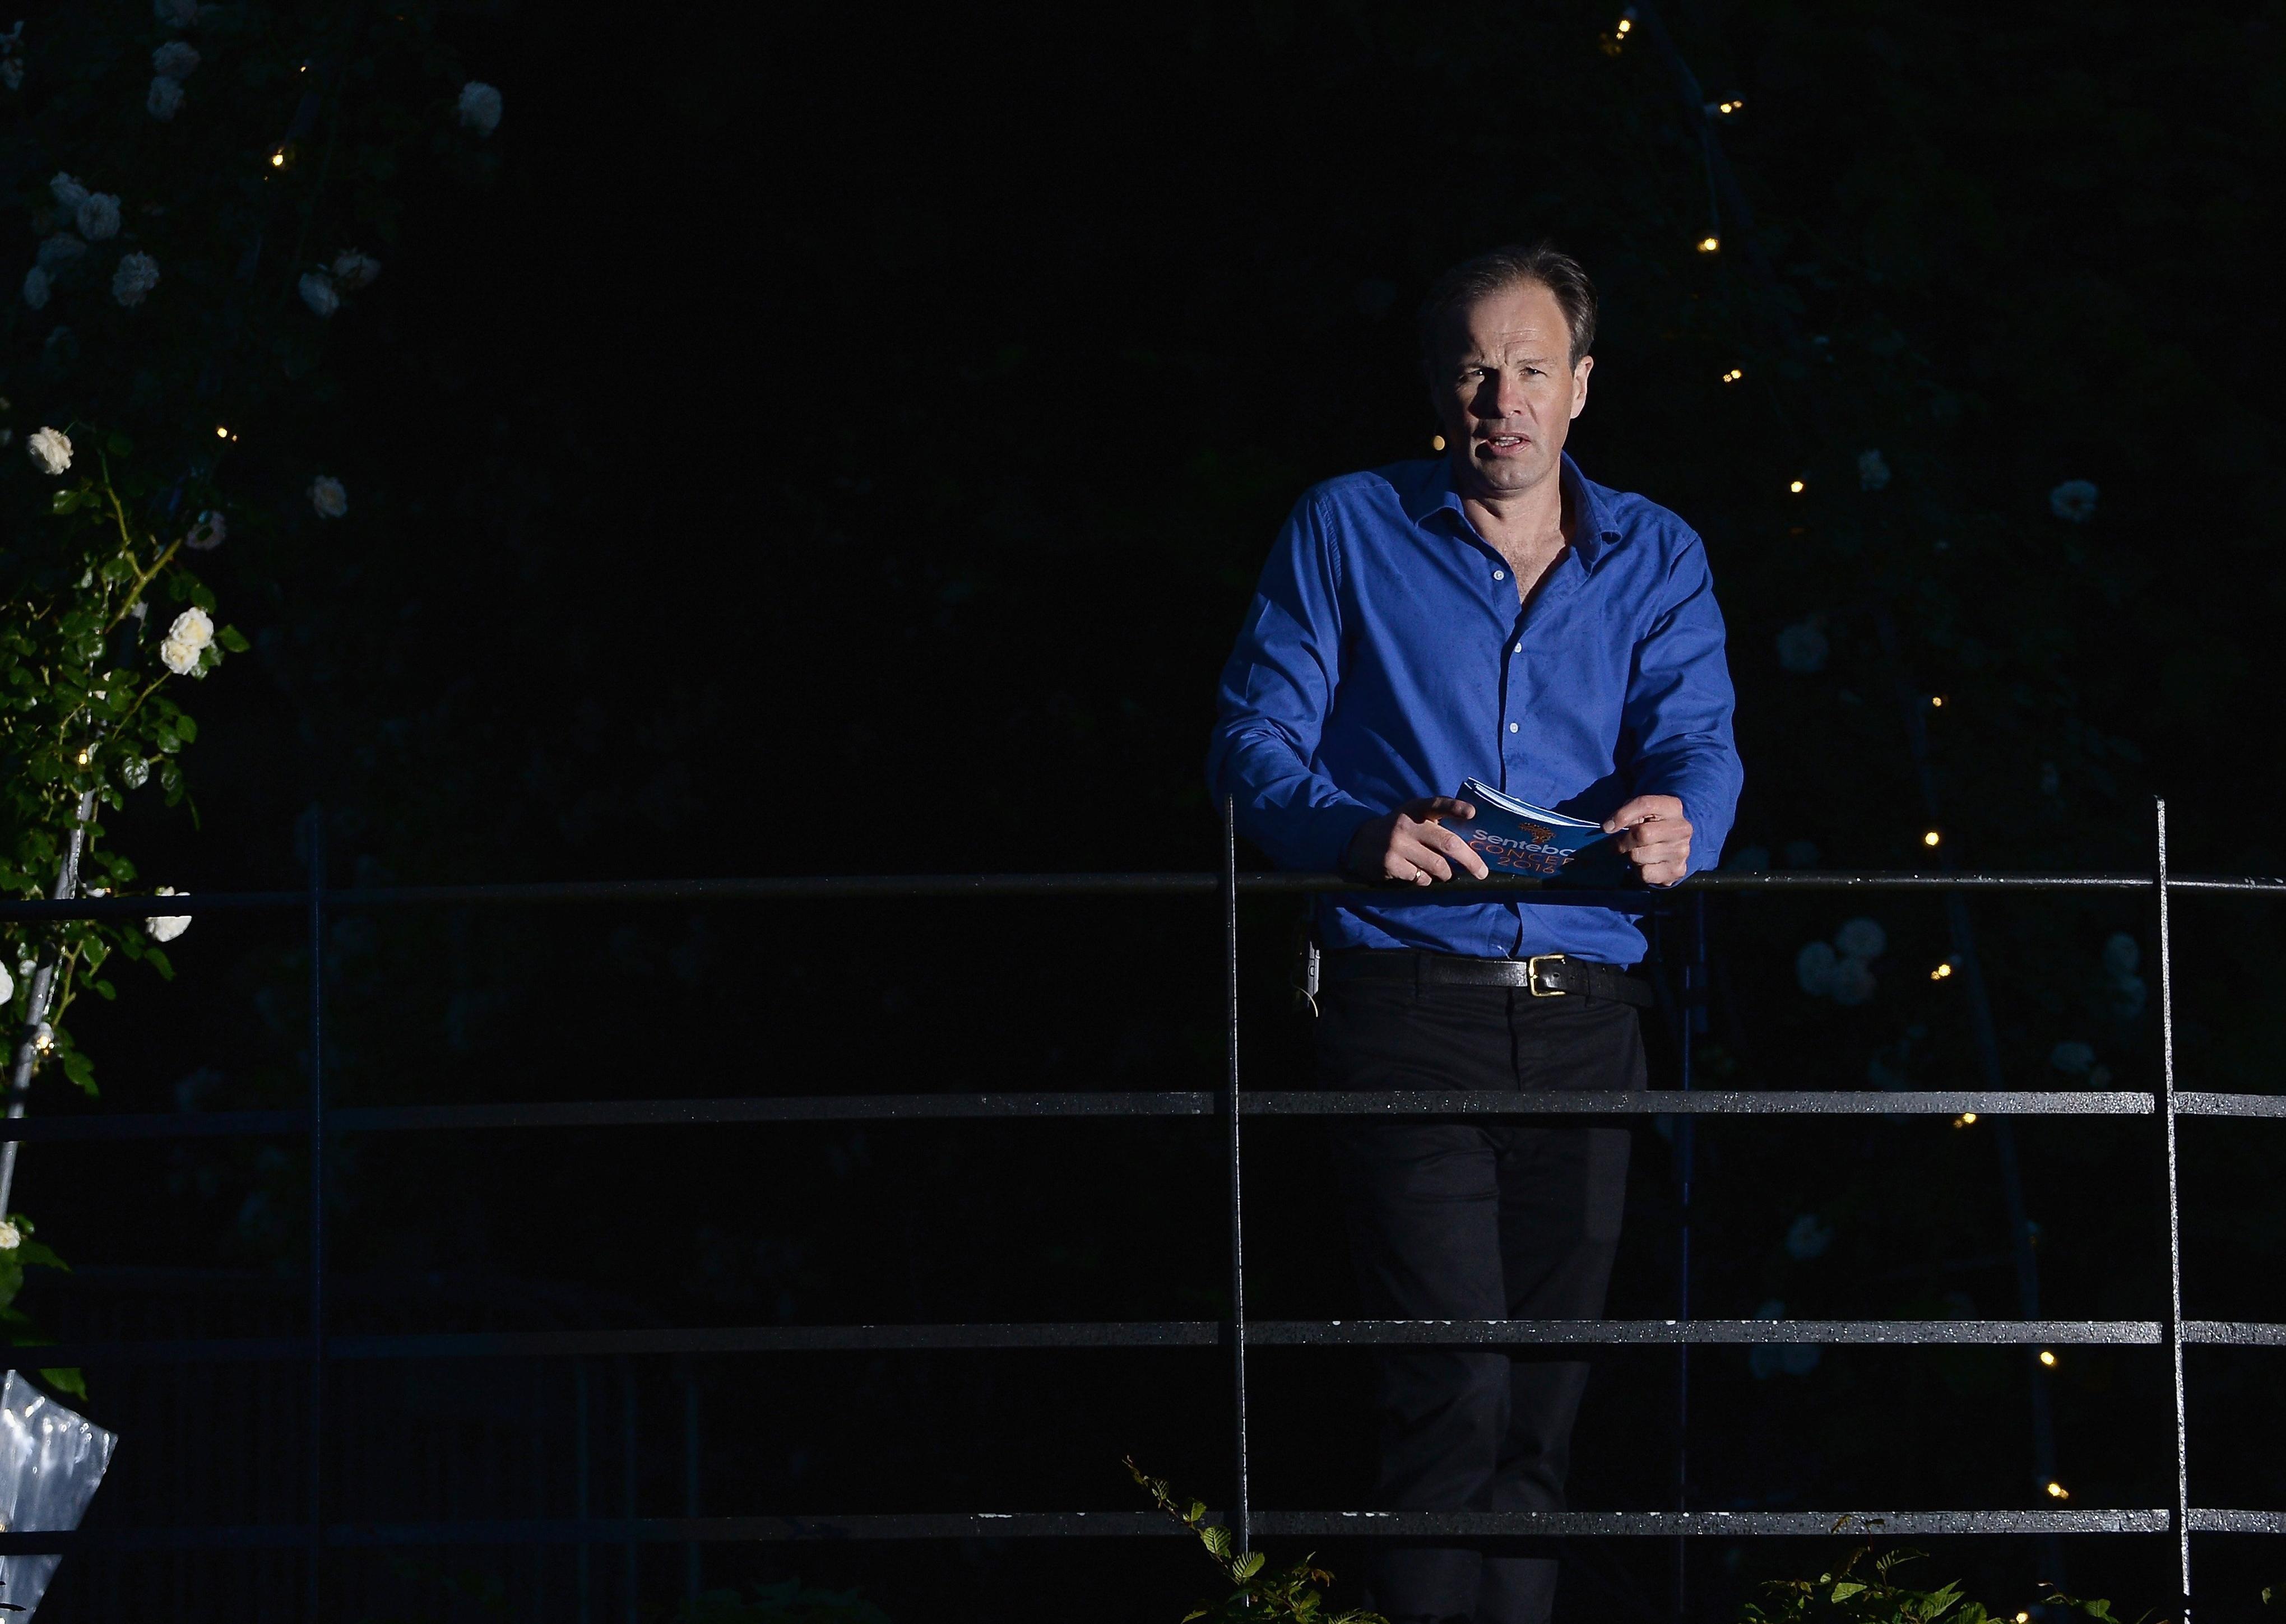 How ITV news anchor Tom Bradby's 'massive meltdown' changed his outlook on life